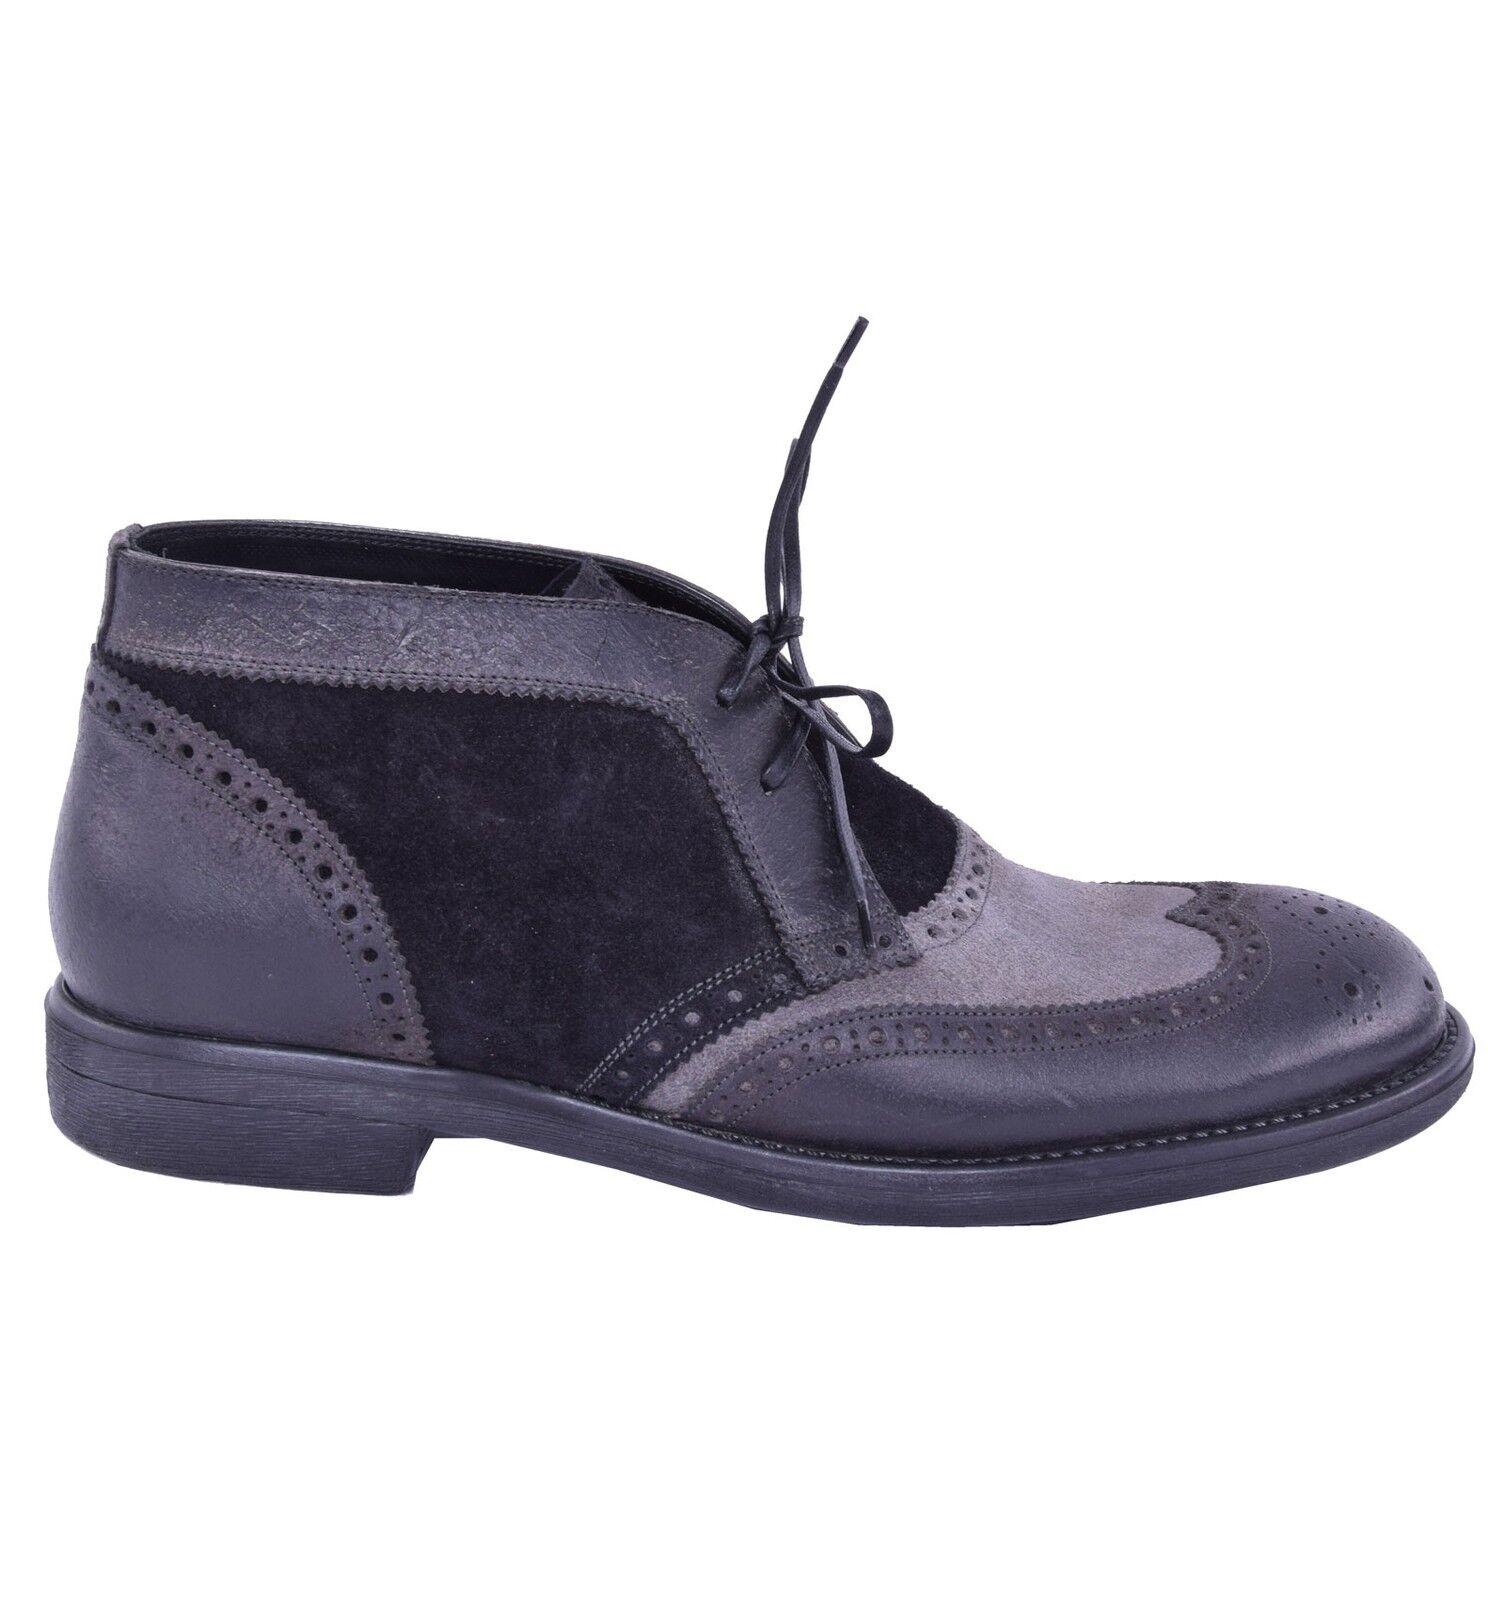 Dolce & gabbana bicolor boots black grey shoes boots shoes 03819